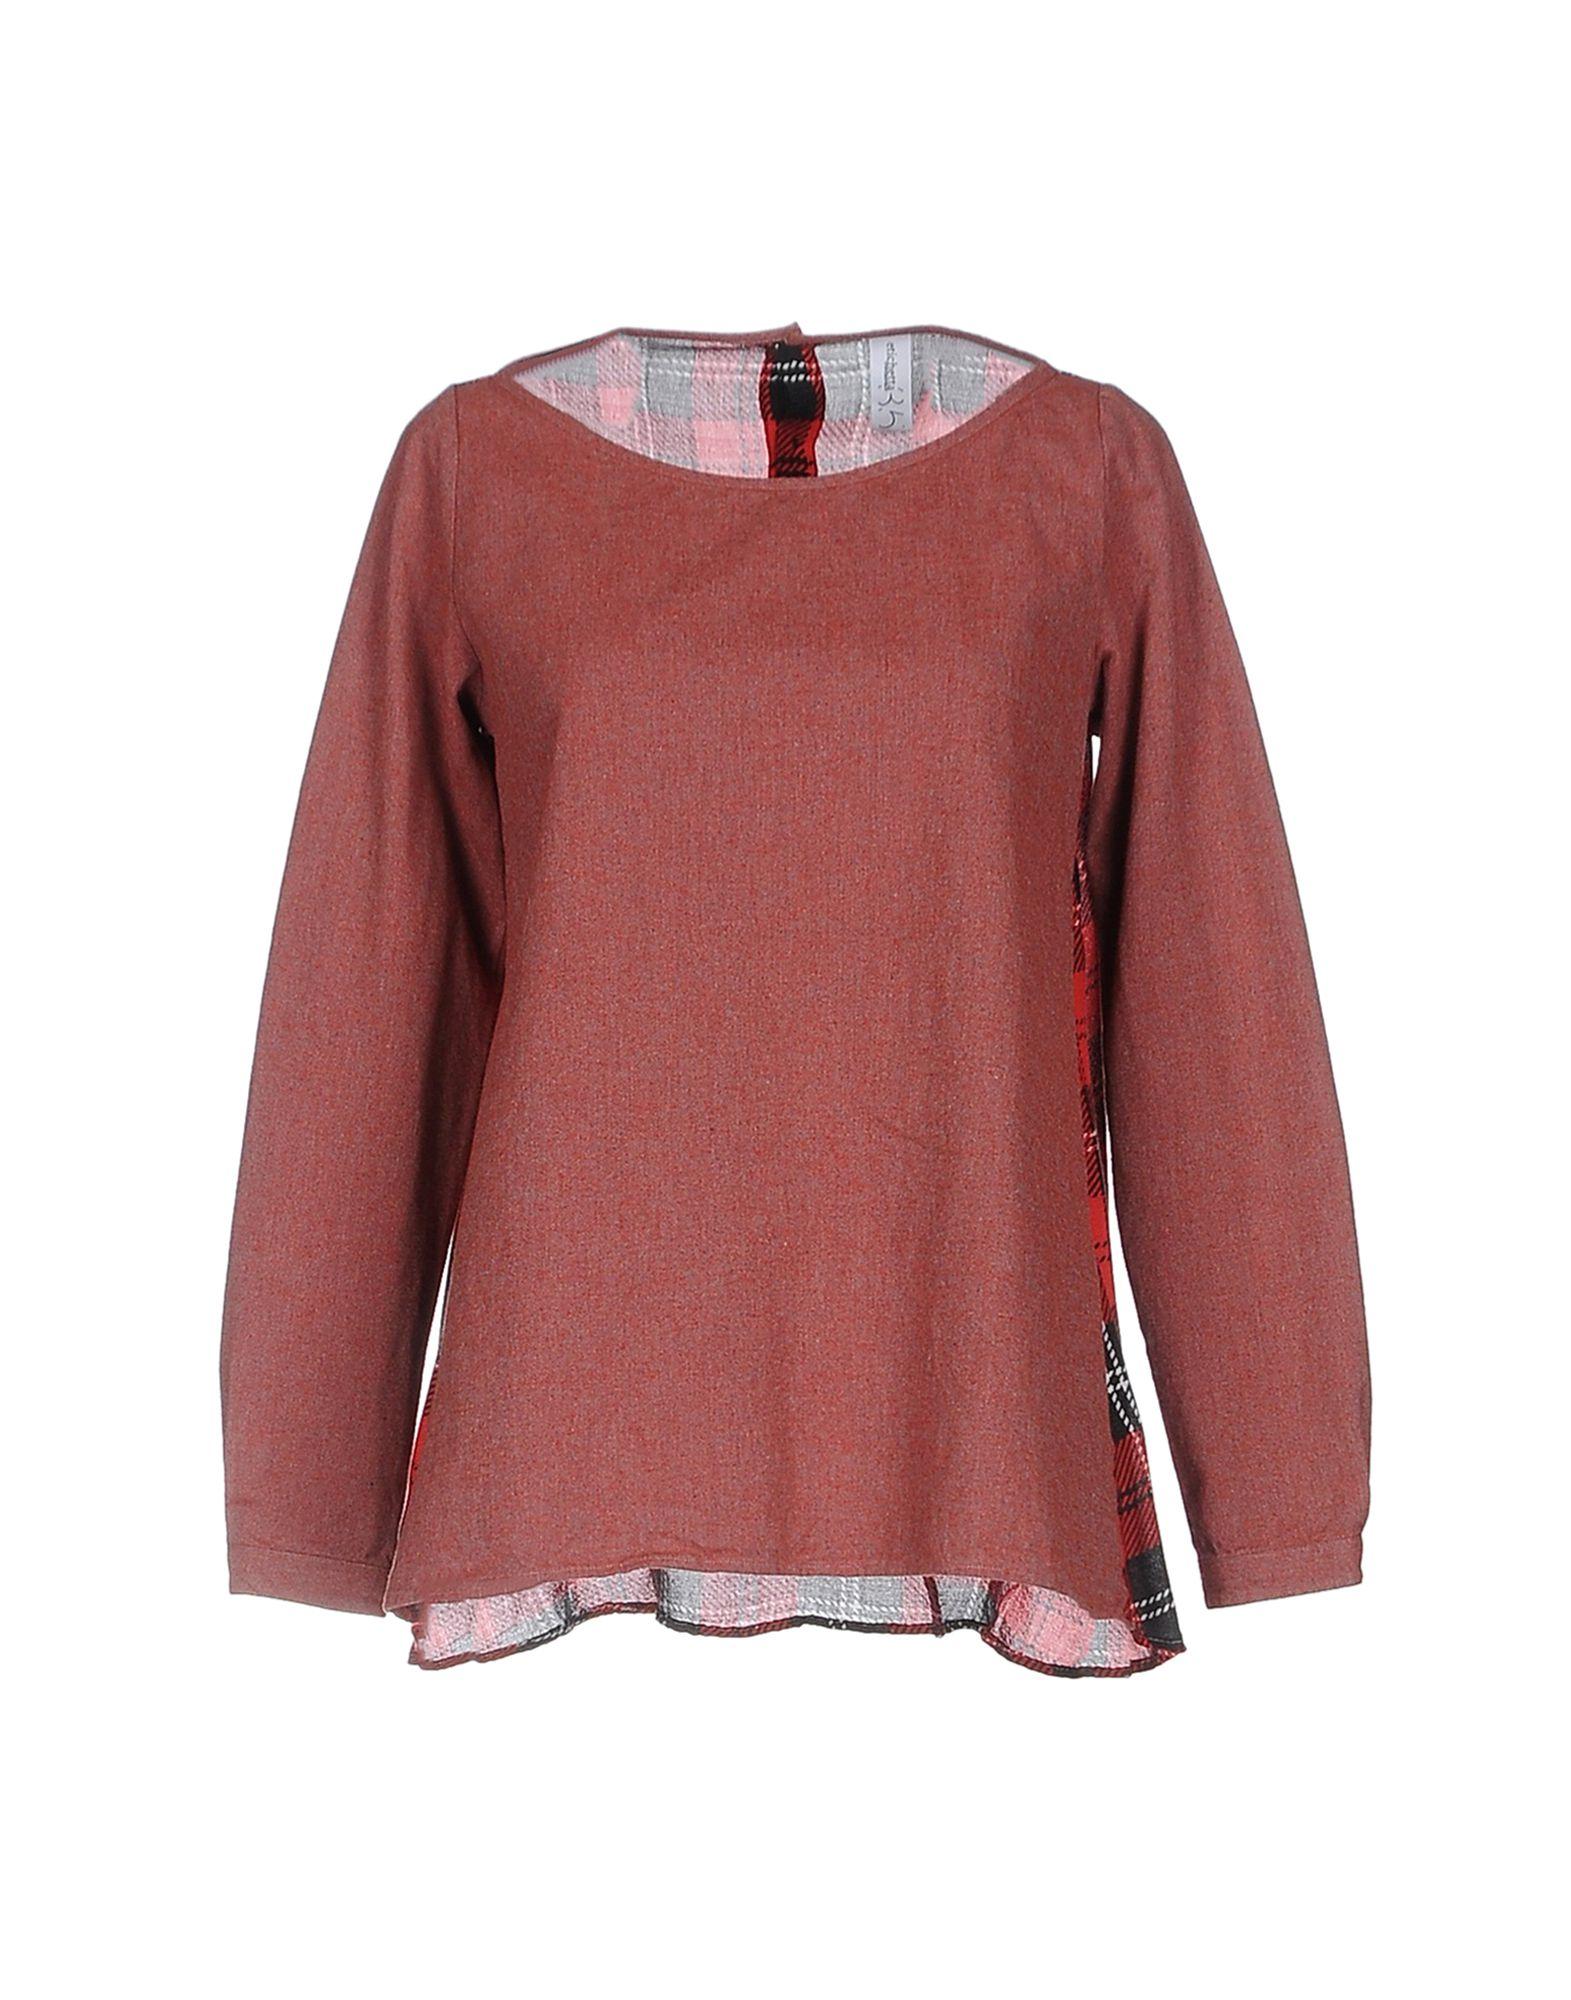 ФОТО etichetta 35 блузка